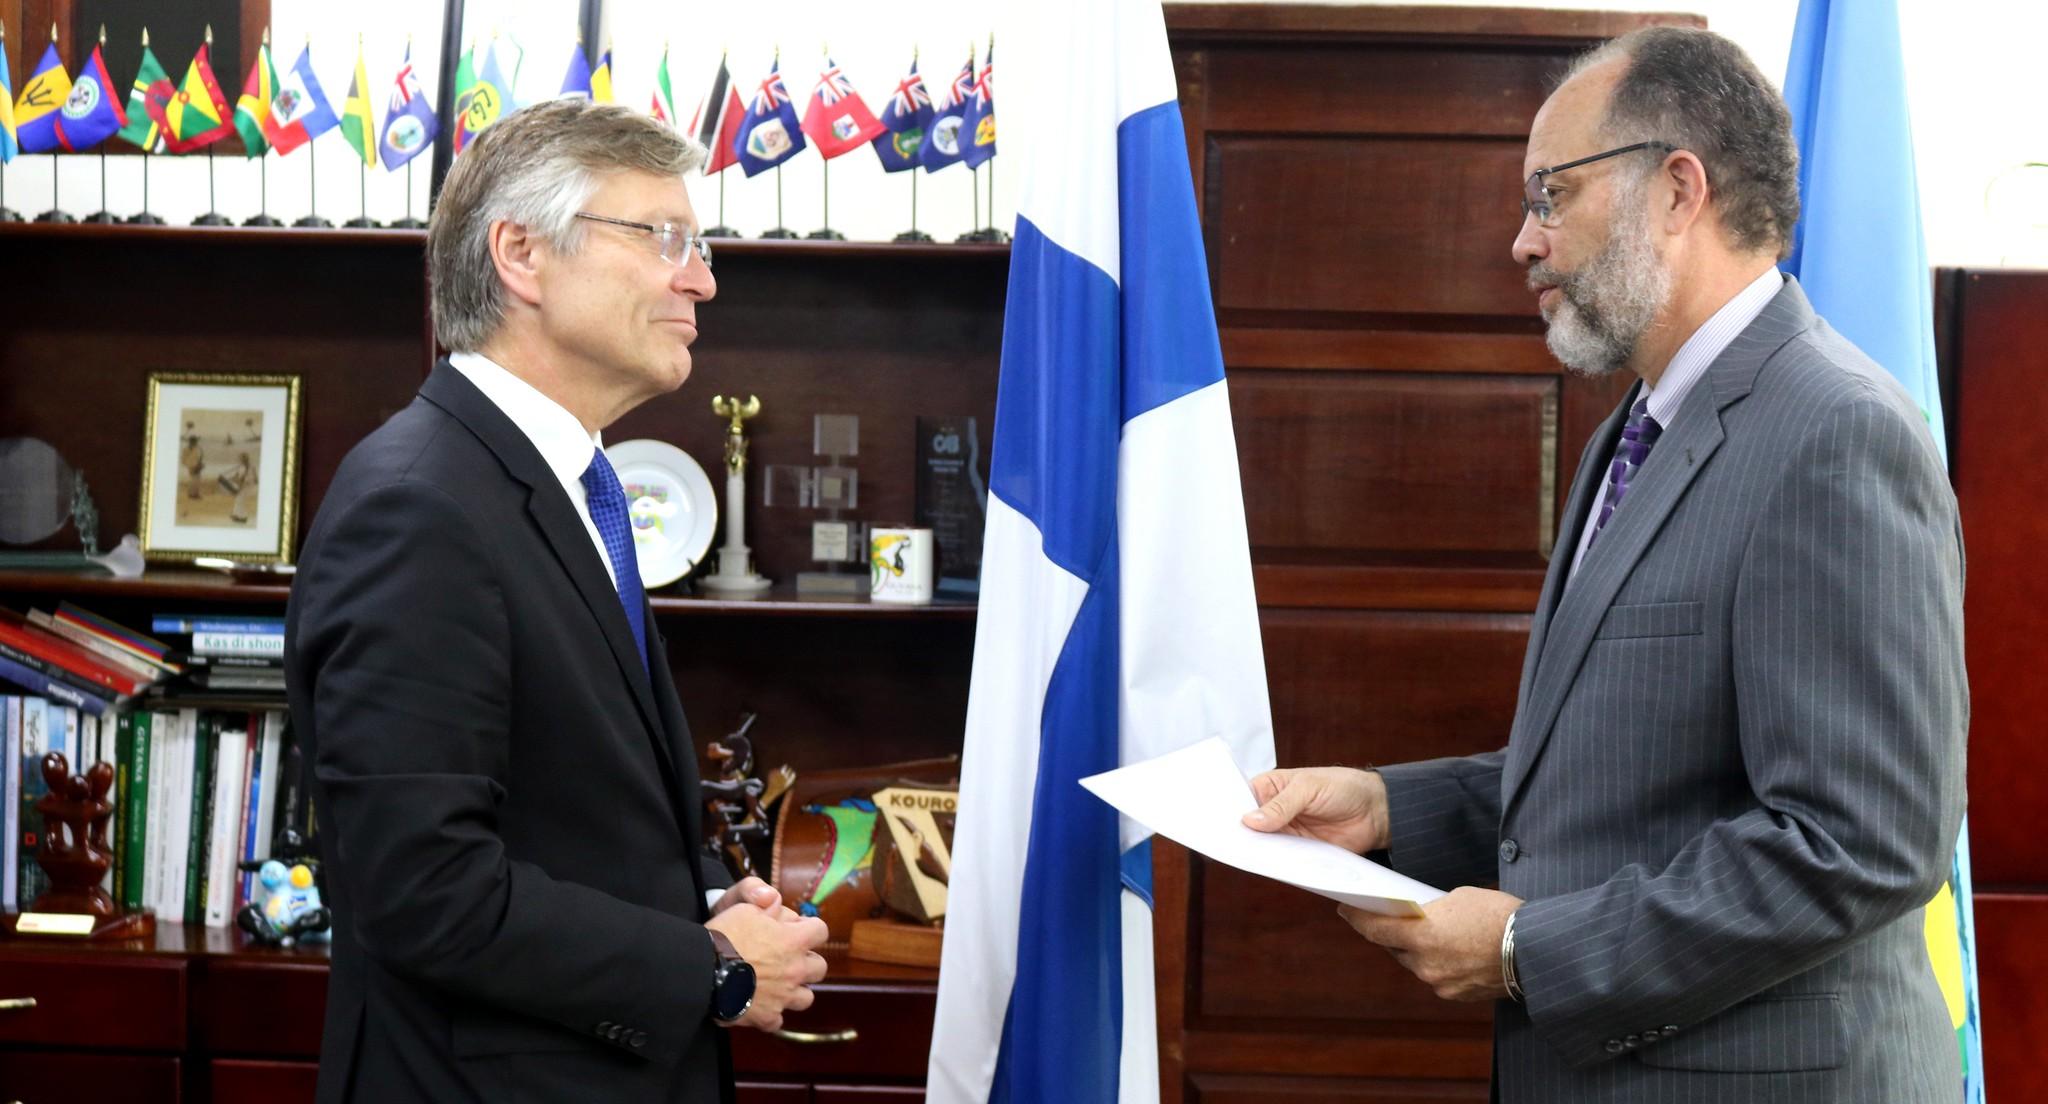 Amb. Irwin La Rocque receives the credentials of His Excellency Pertti Ikonen